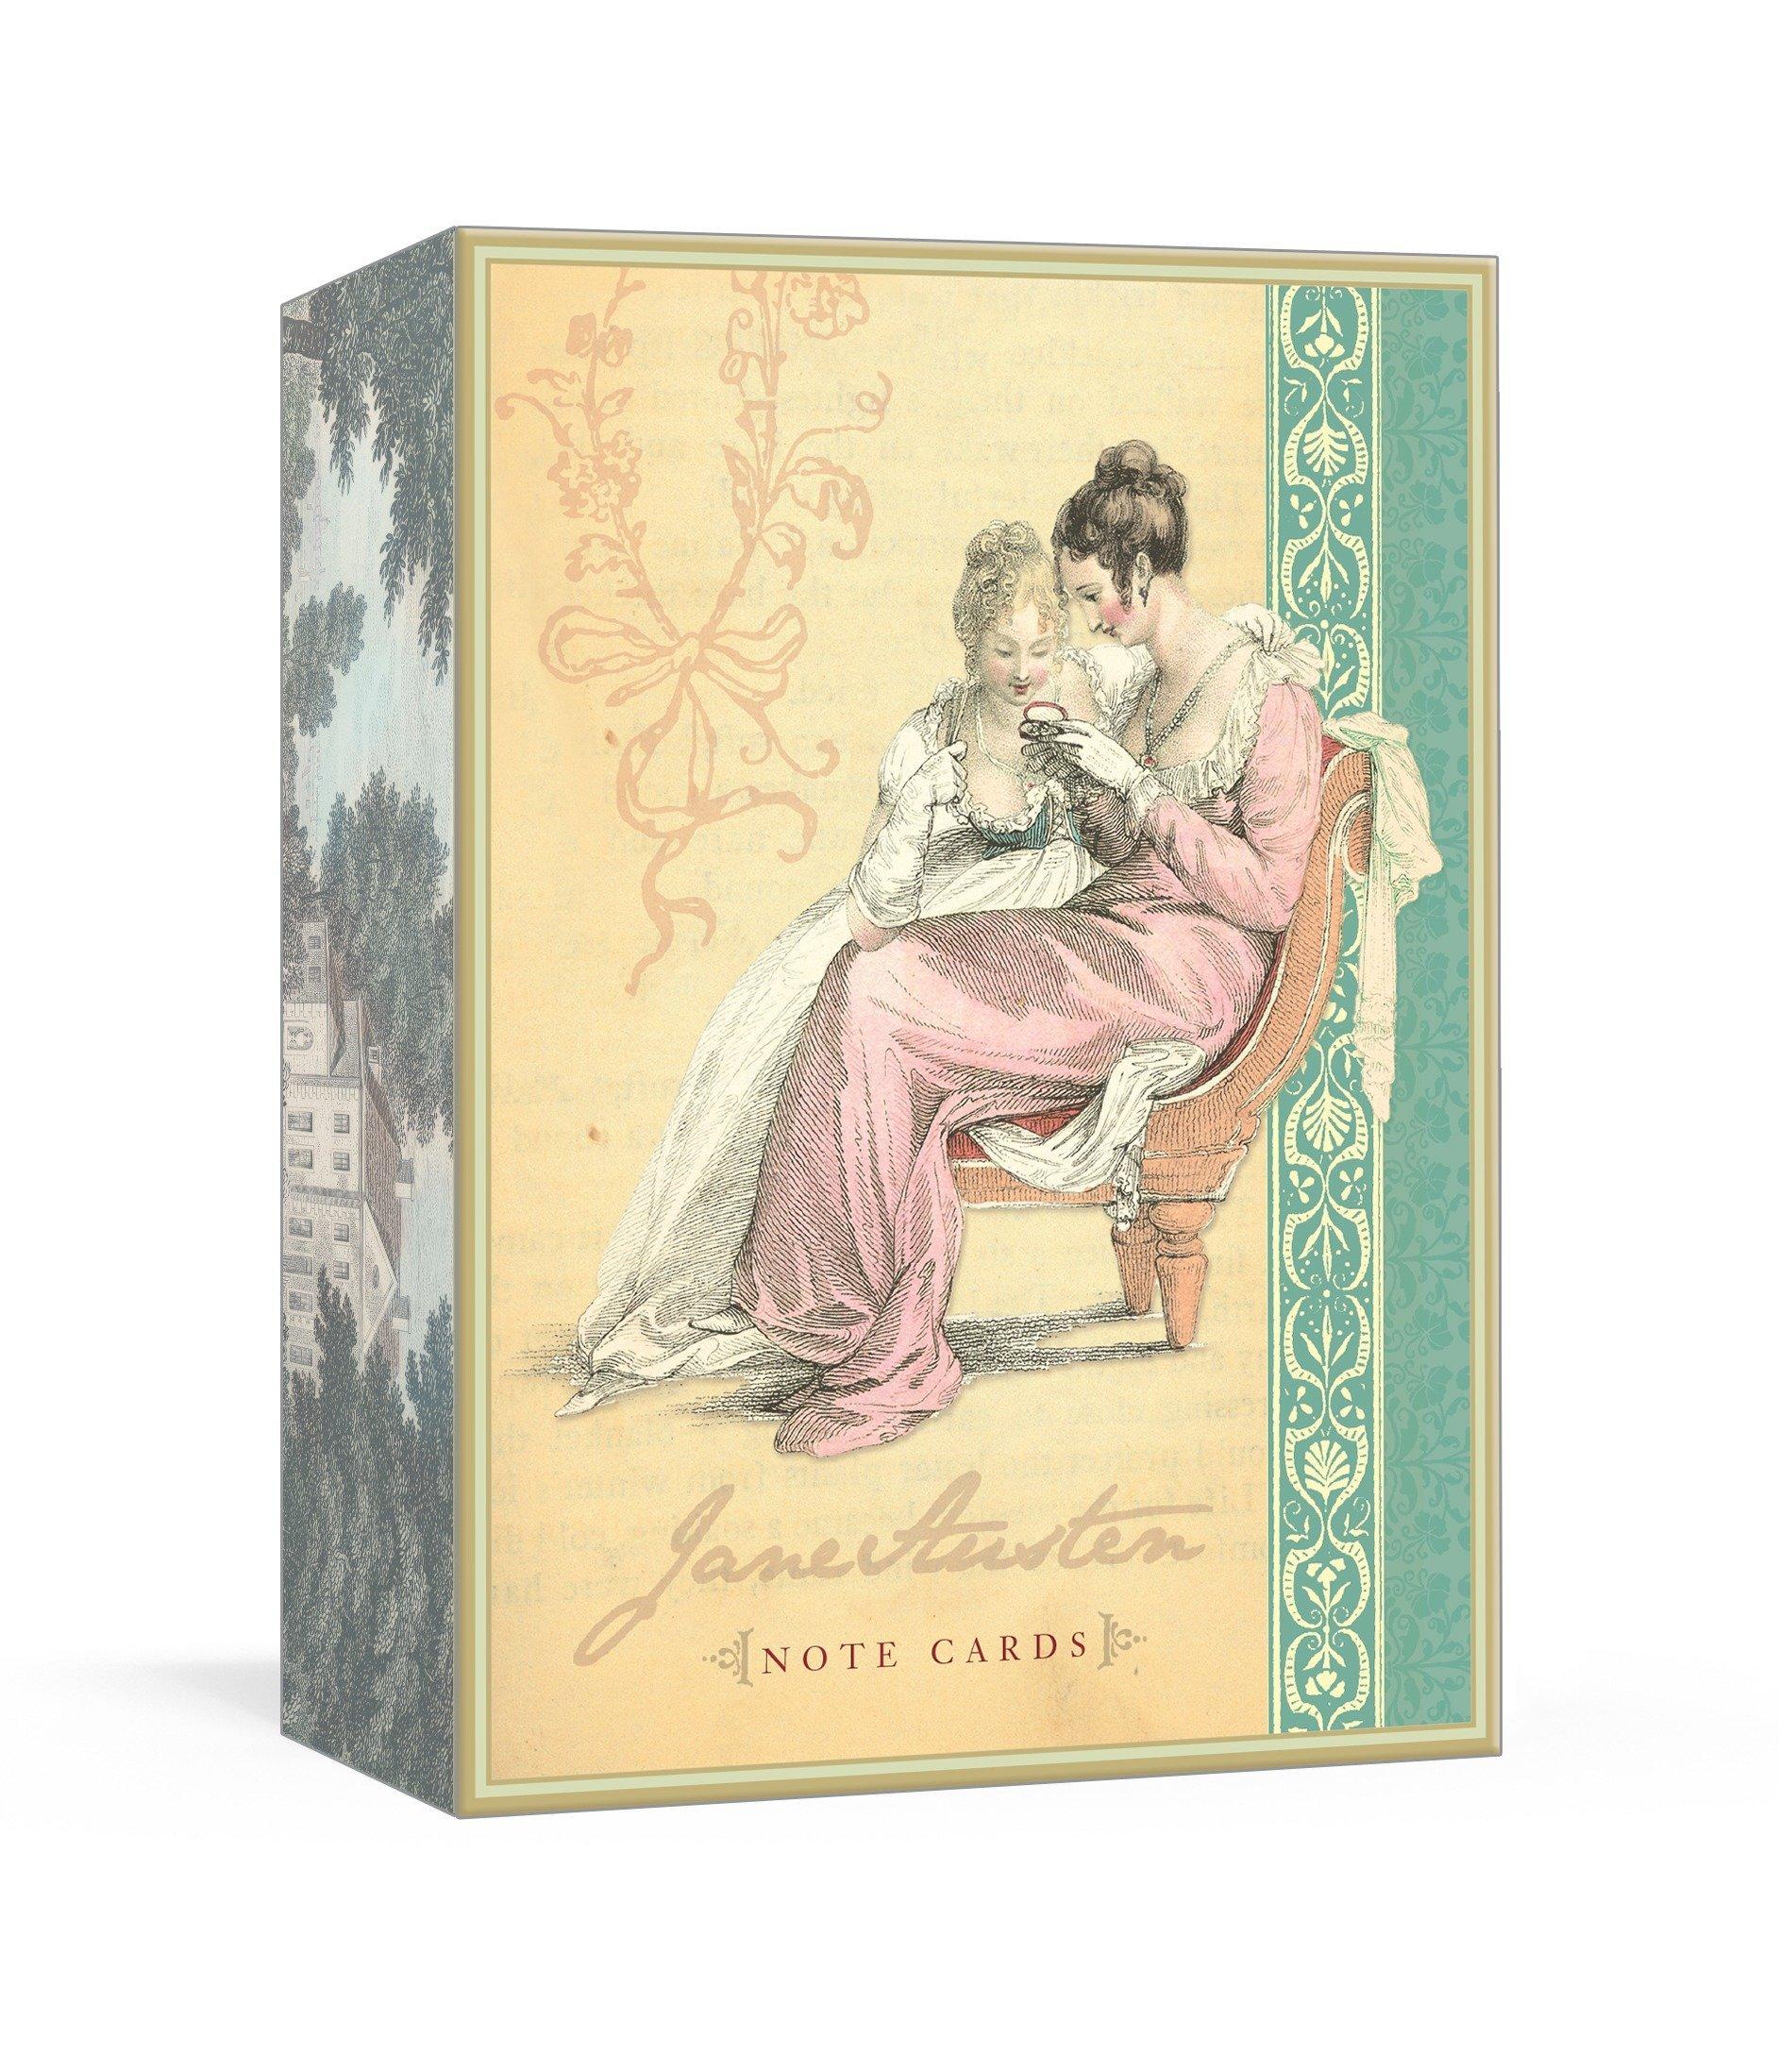 Jane Austen Note Cards: Amazon.es: Potter Gift: Libros en ...